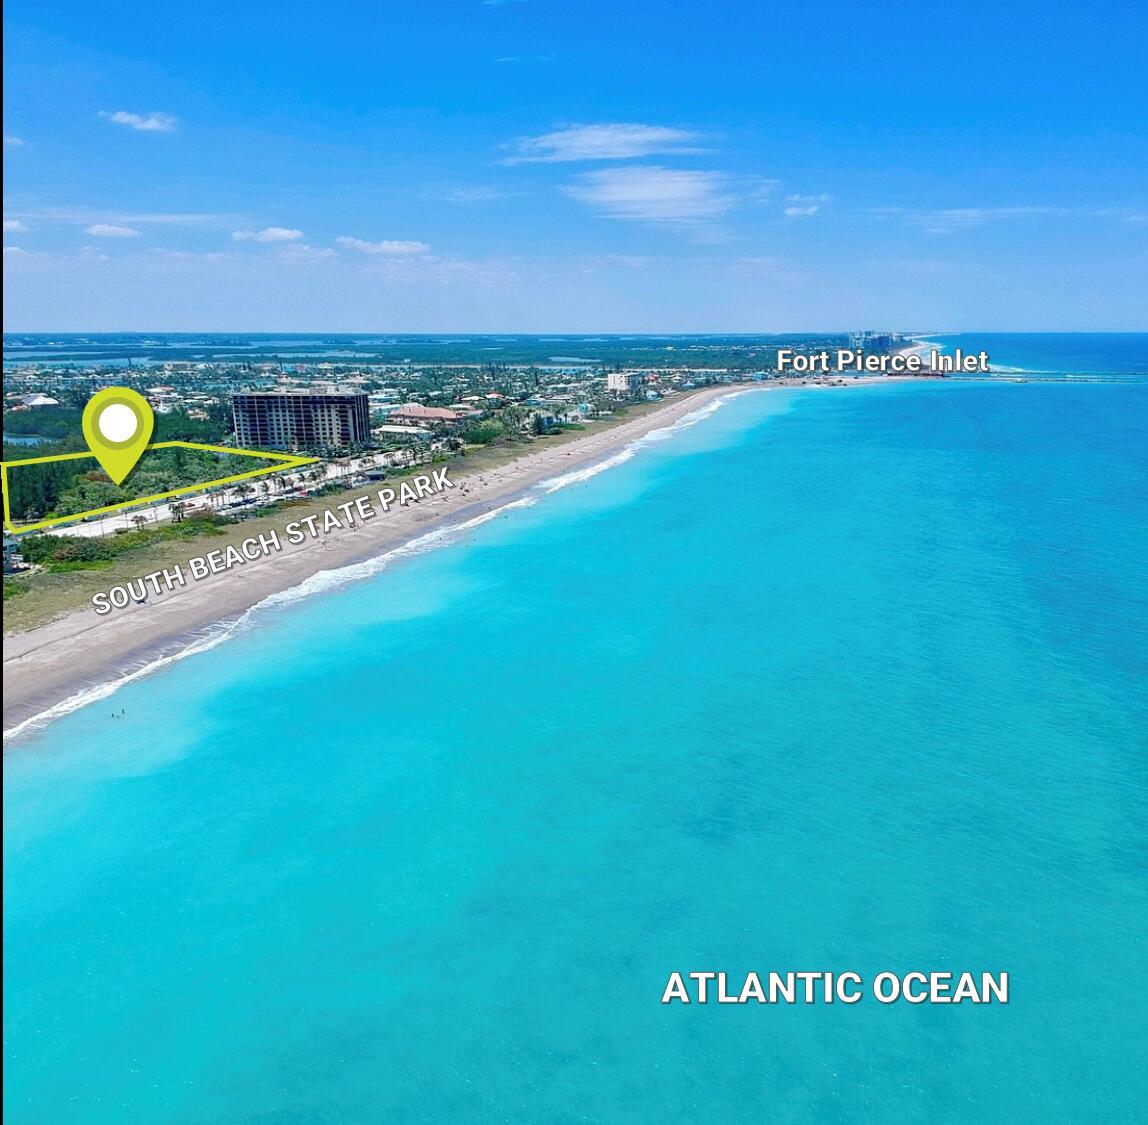 Details for 901 Ocean Drive S, Fort Pierce, FL 34949